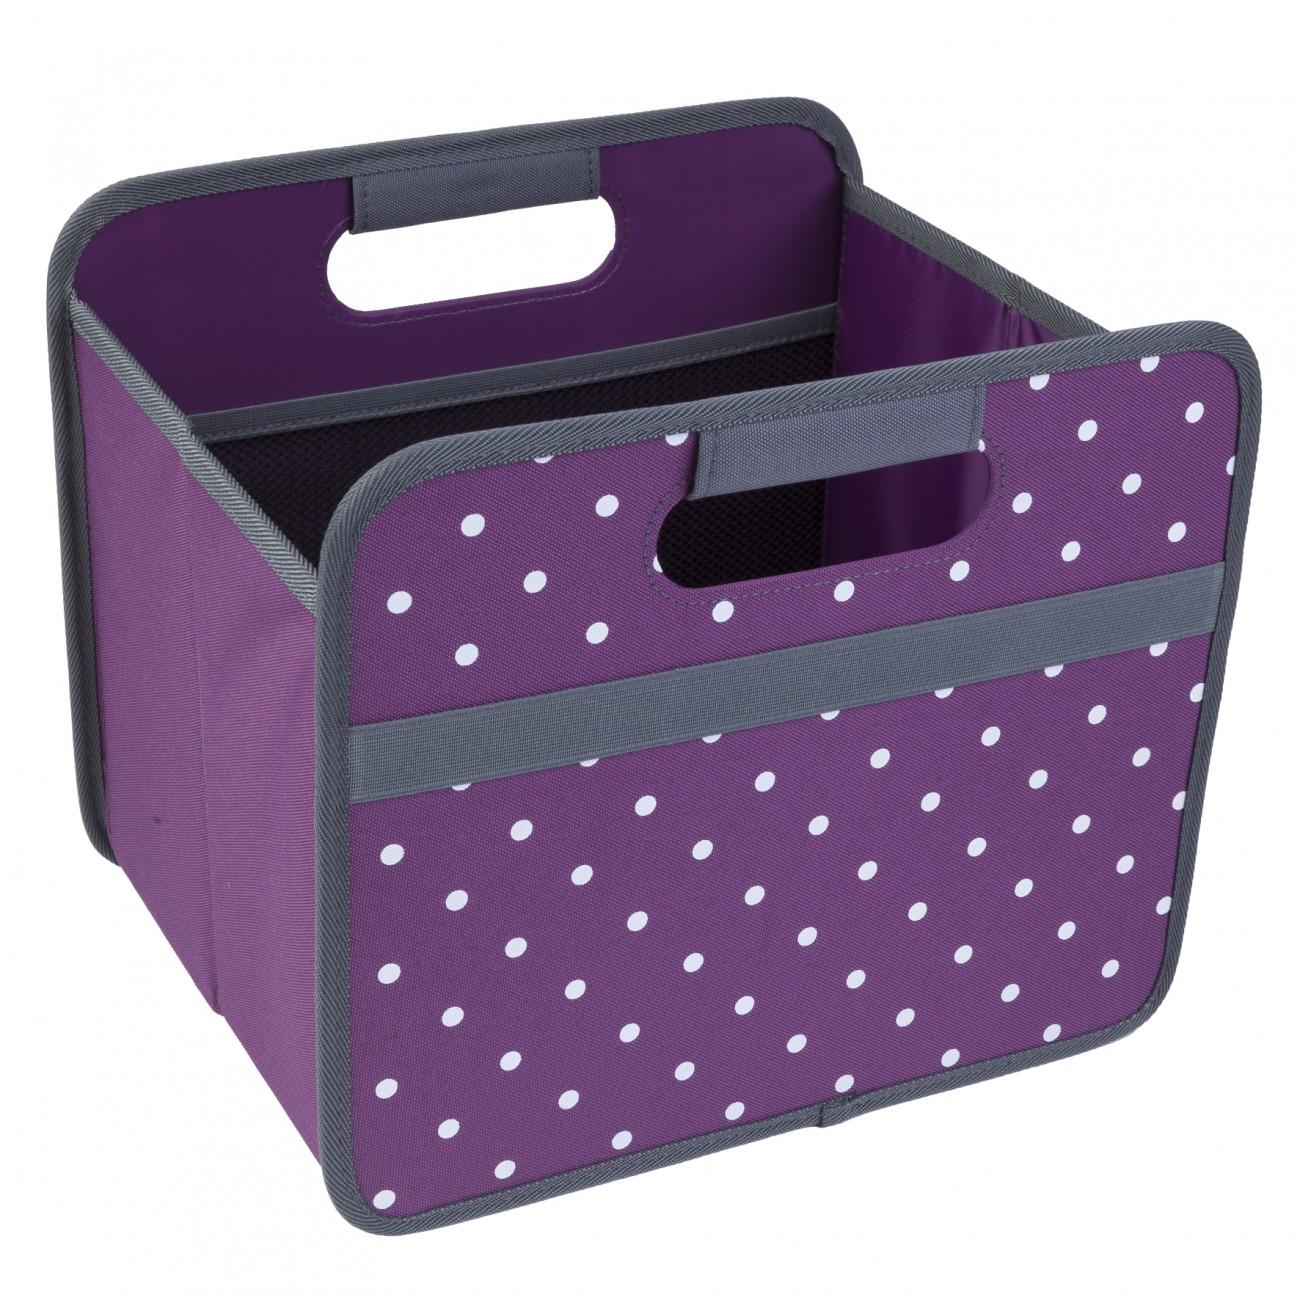 meori 15l box lila punkte faltbox transportkiste. Black Bedroom Furniture Sets. Home Design Ideas